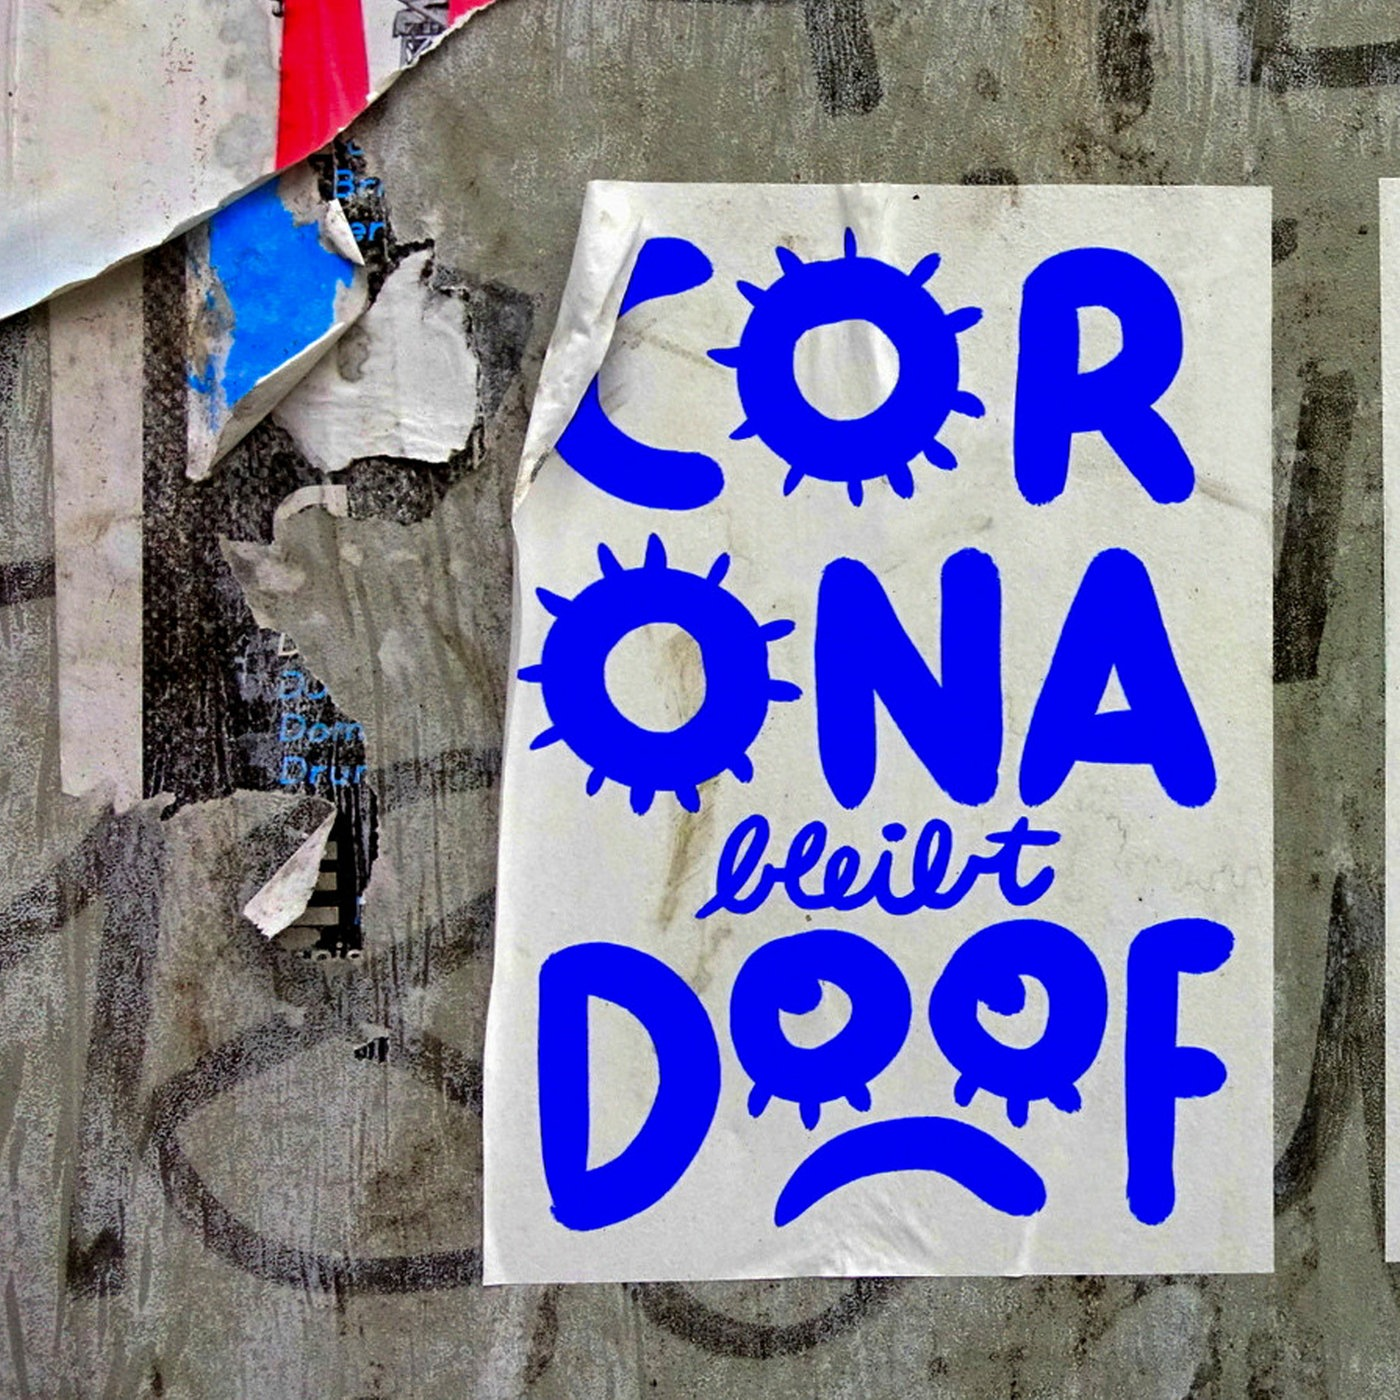 Sechs Wochen im Frühling - Semi-dokumentarische Corona-Chronik